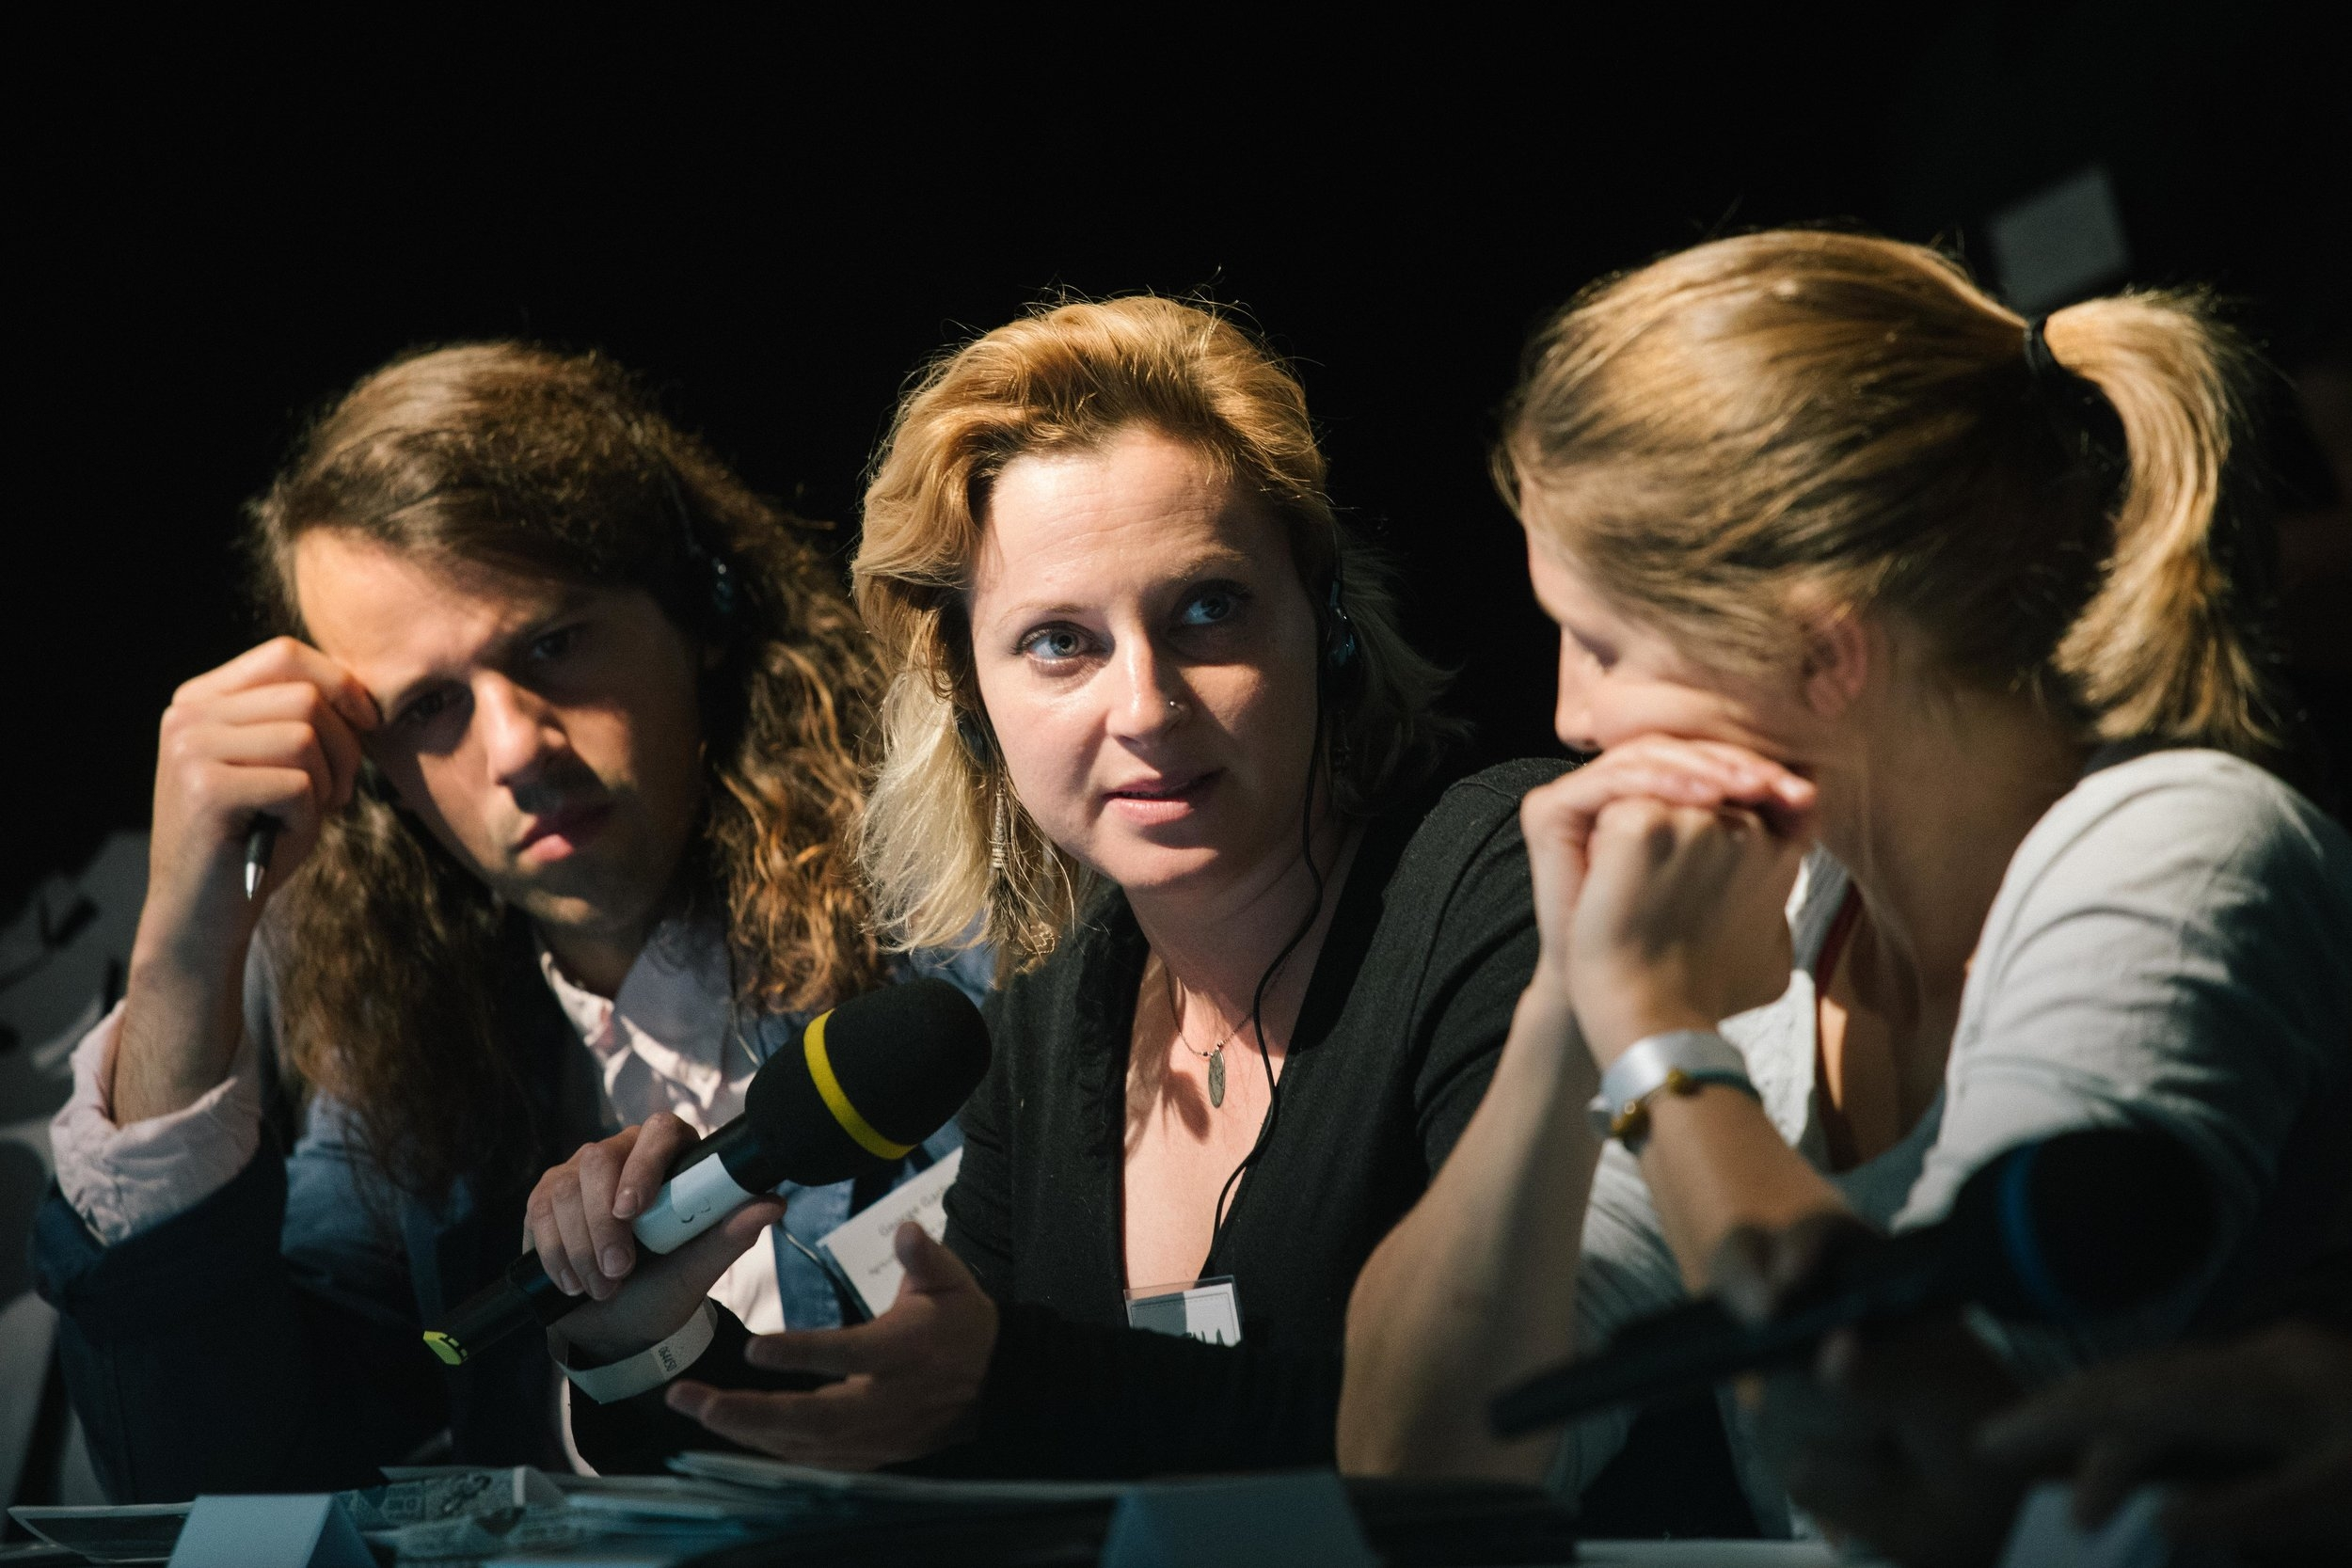 George Garbutt, Ariella Helfgott (Svenja Flechtner)